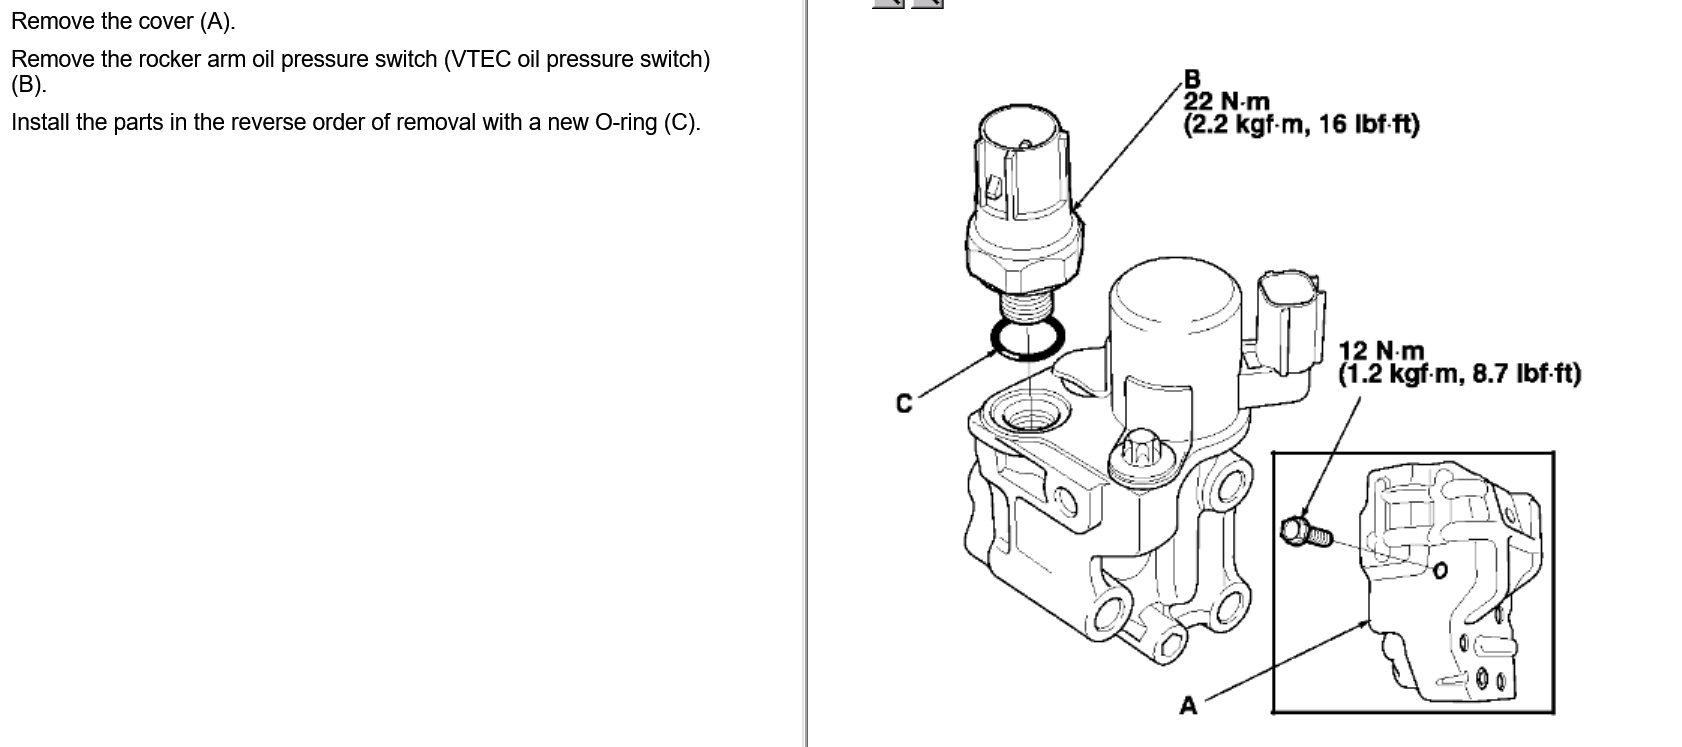 i have a p2647 code says a rocker arm actuator control